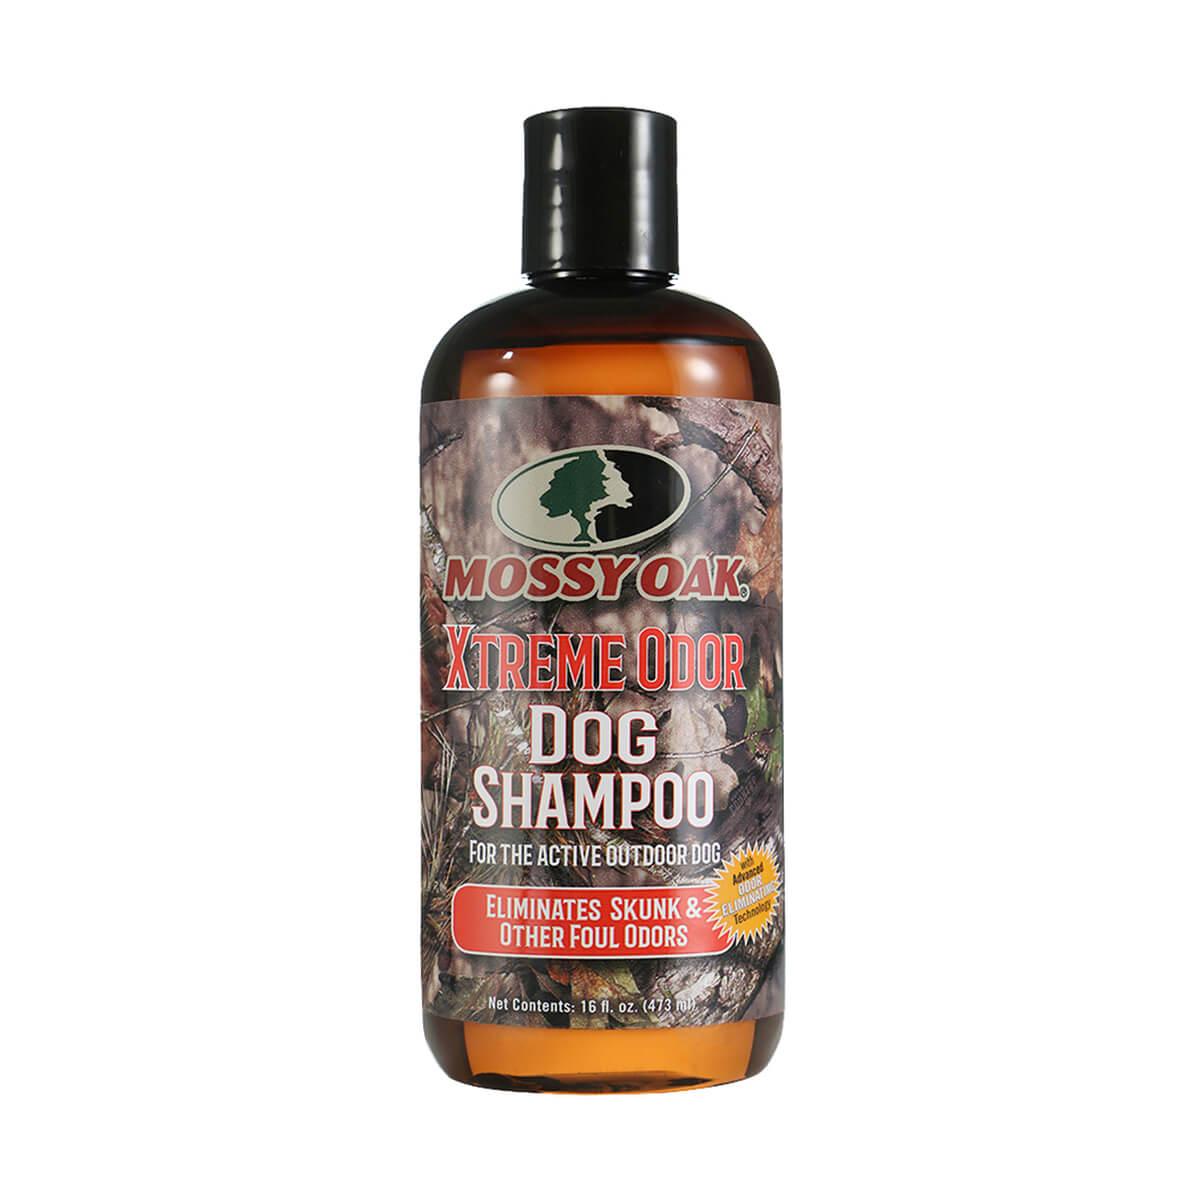 Mossy Oak Xtreme Odor Dog Shampoo - 16oz